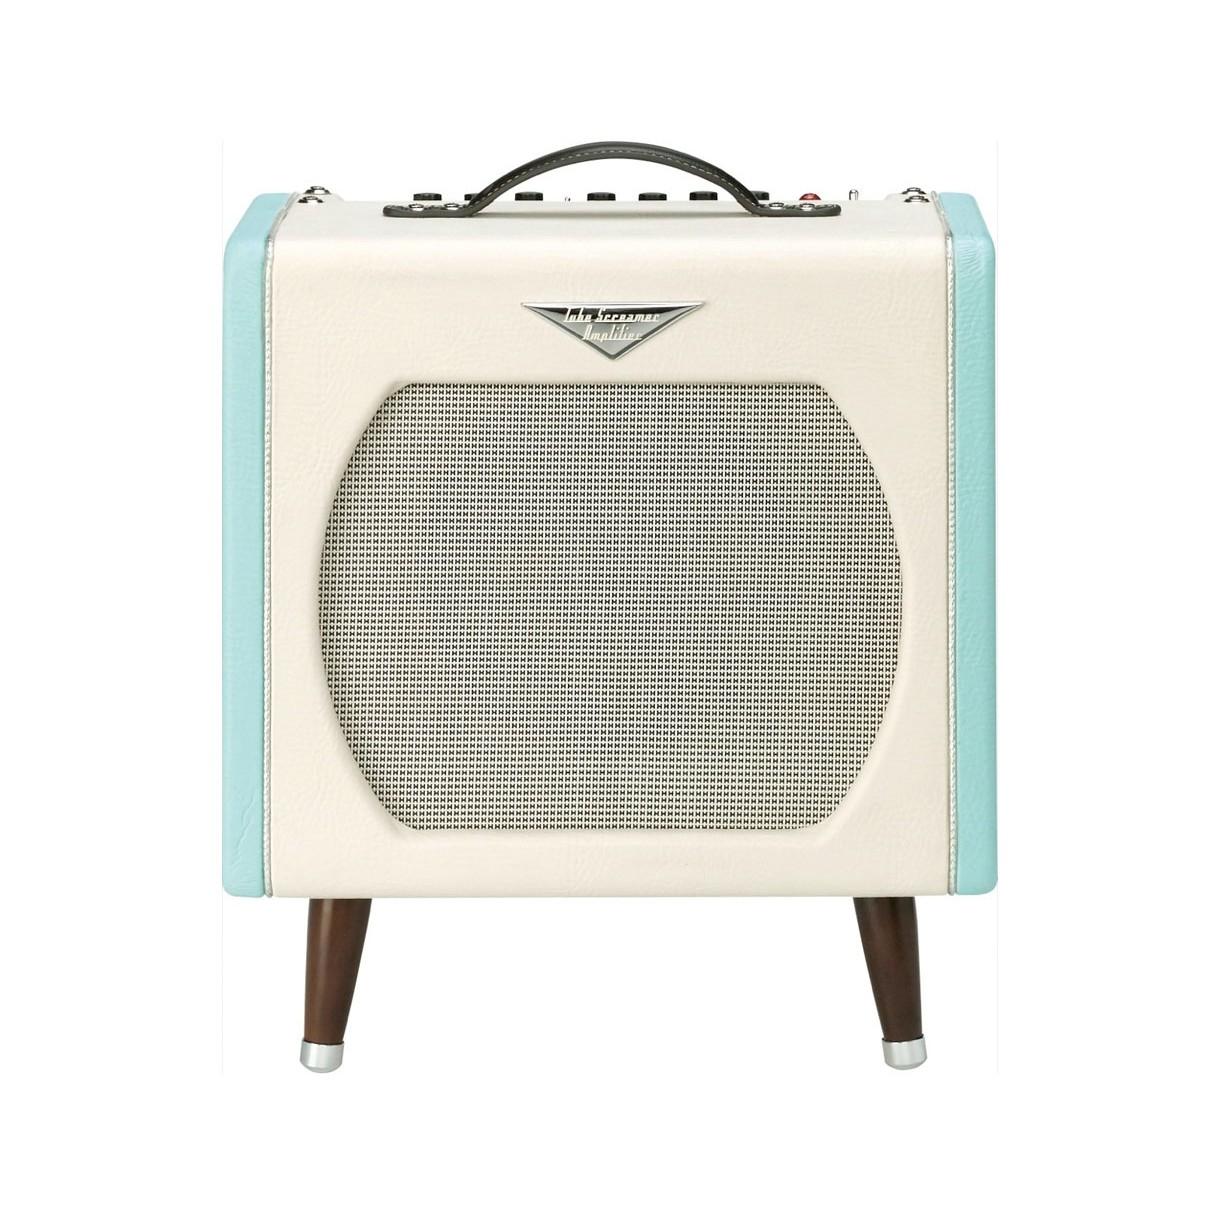 ibanez tsa5tvr tube screamer 5 watt guitar combo amplifier. Black Bedroom Furniture Sets. Home Design Ideas